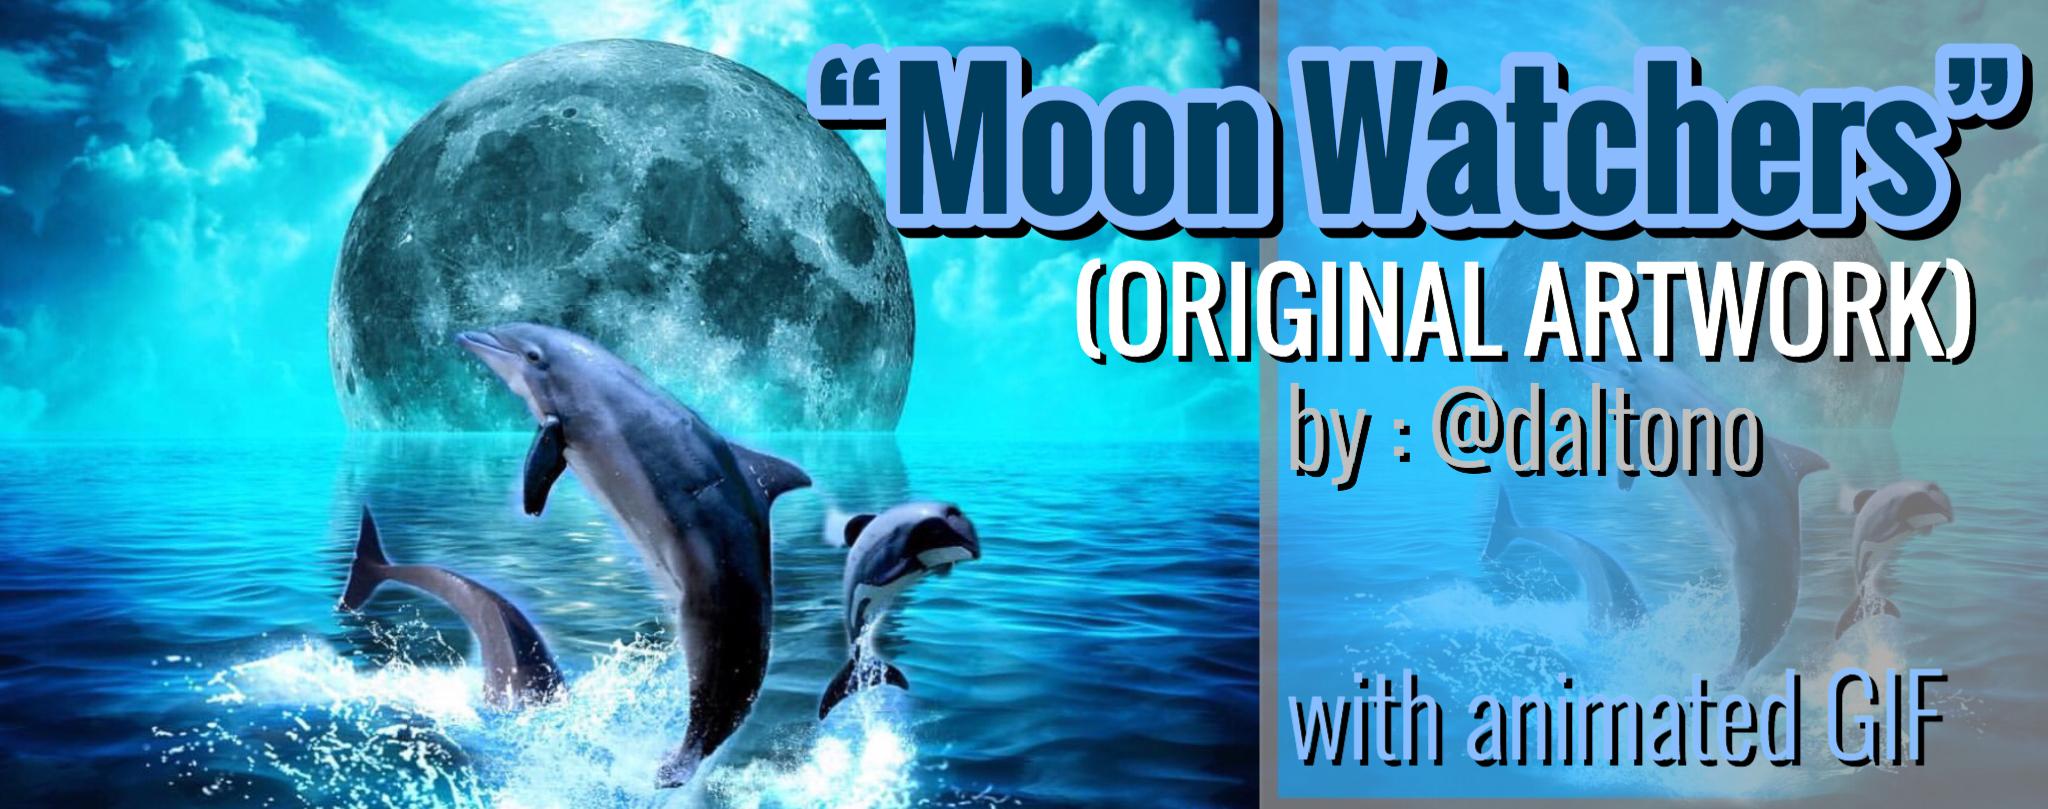 moon-watchers-thumbnail.JPG